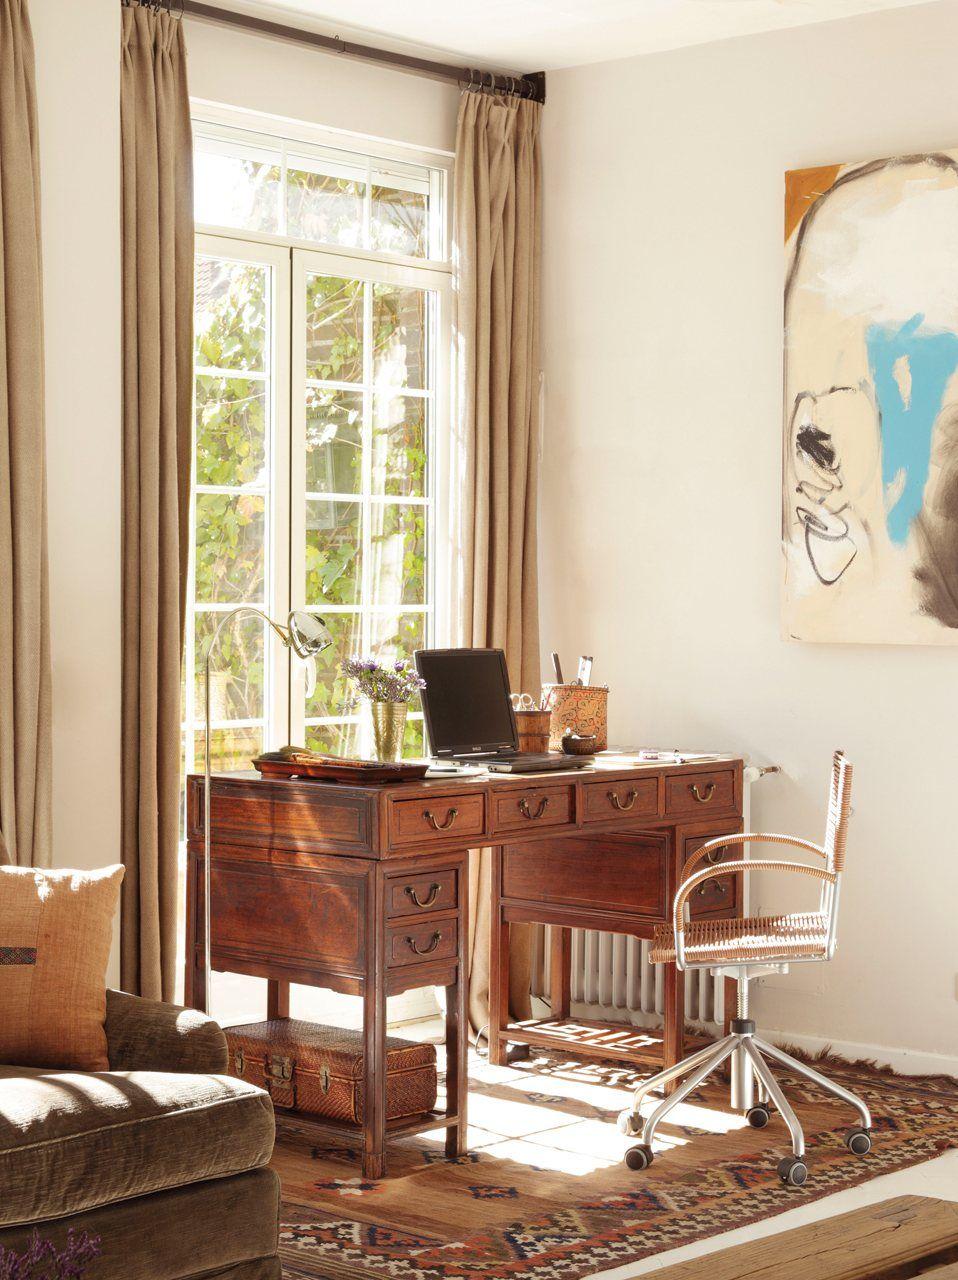 12 buenas ideas para renovar el sal n for Salon workspace